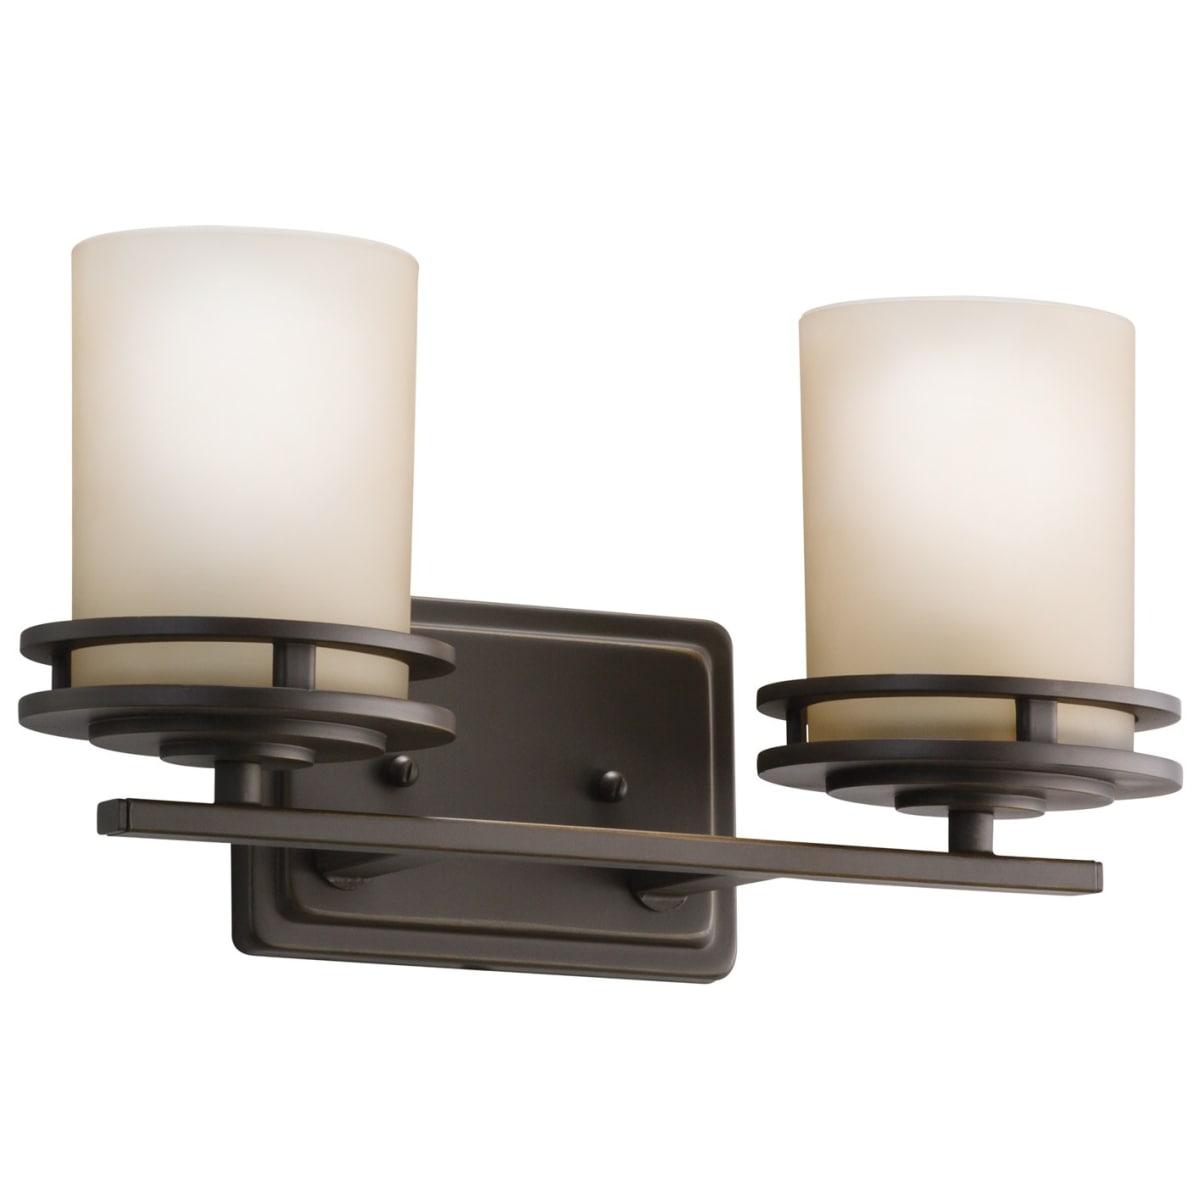 Kichler 5077oz Olde Bronze Hendrik 2 Light 15 Wide Vanity Light Bathroom Fixture With Satin Etched Glass Shades Lightingshowplace Com